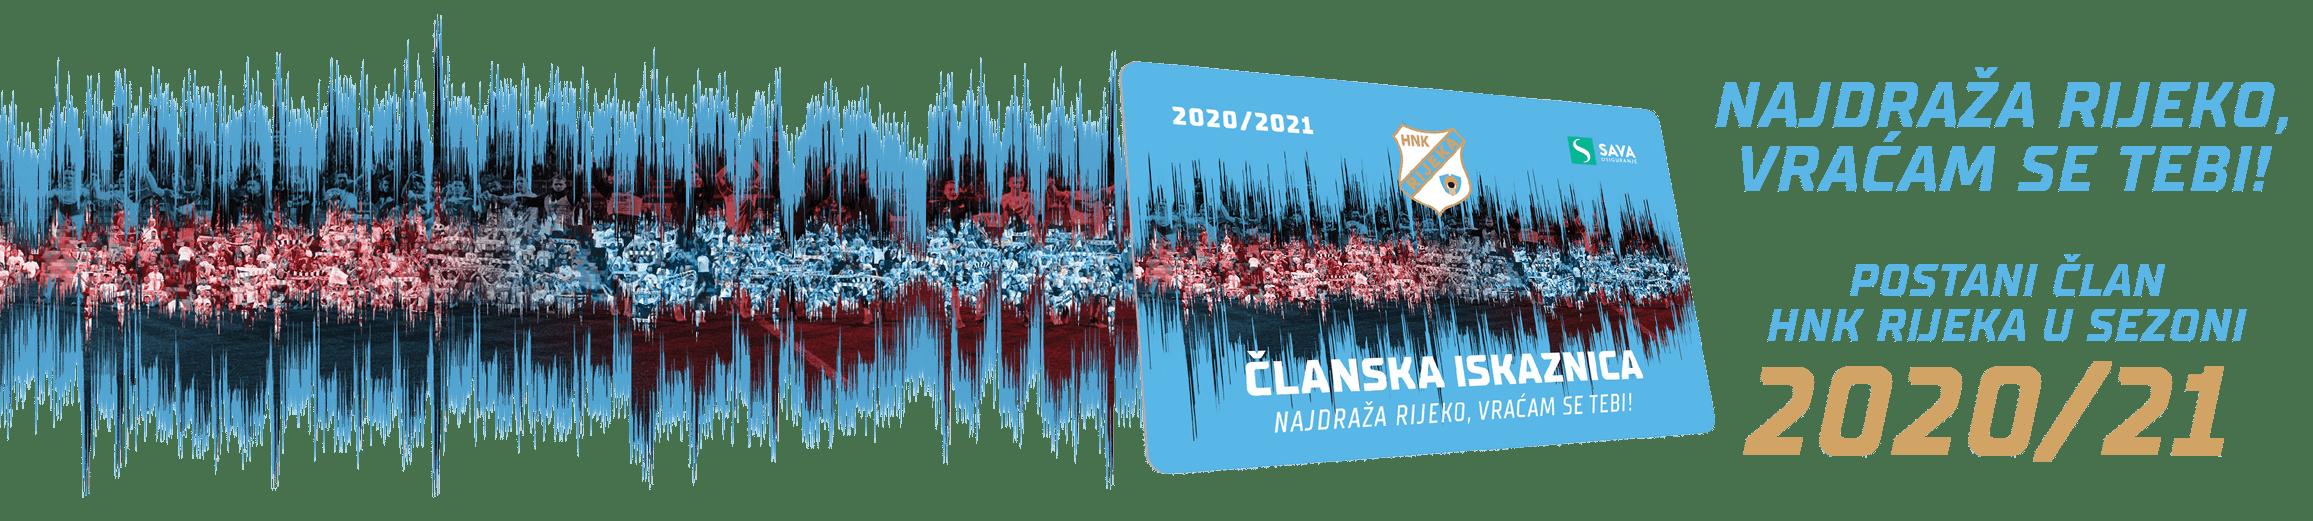 HNK RIJEKA Sezona 2019/20